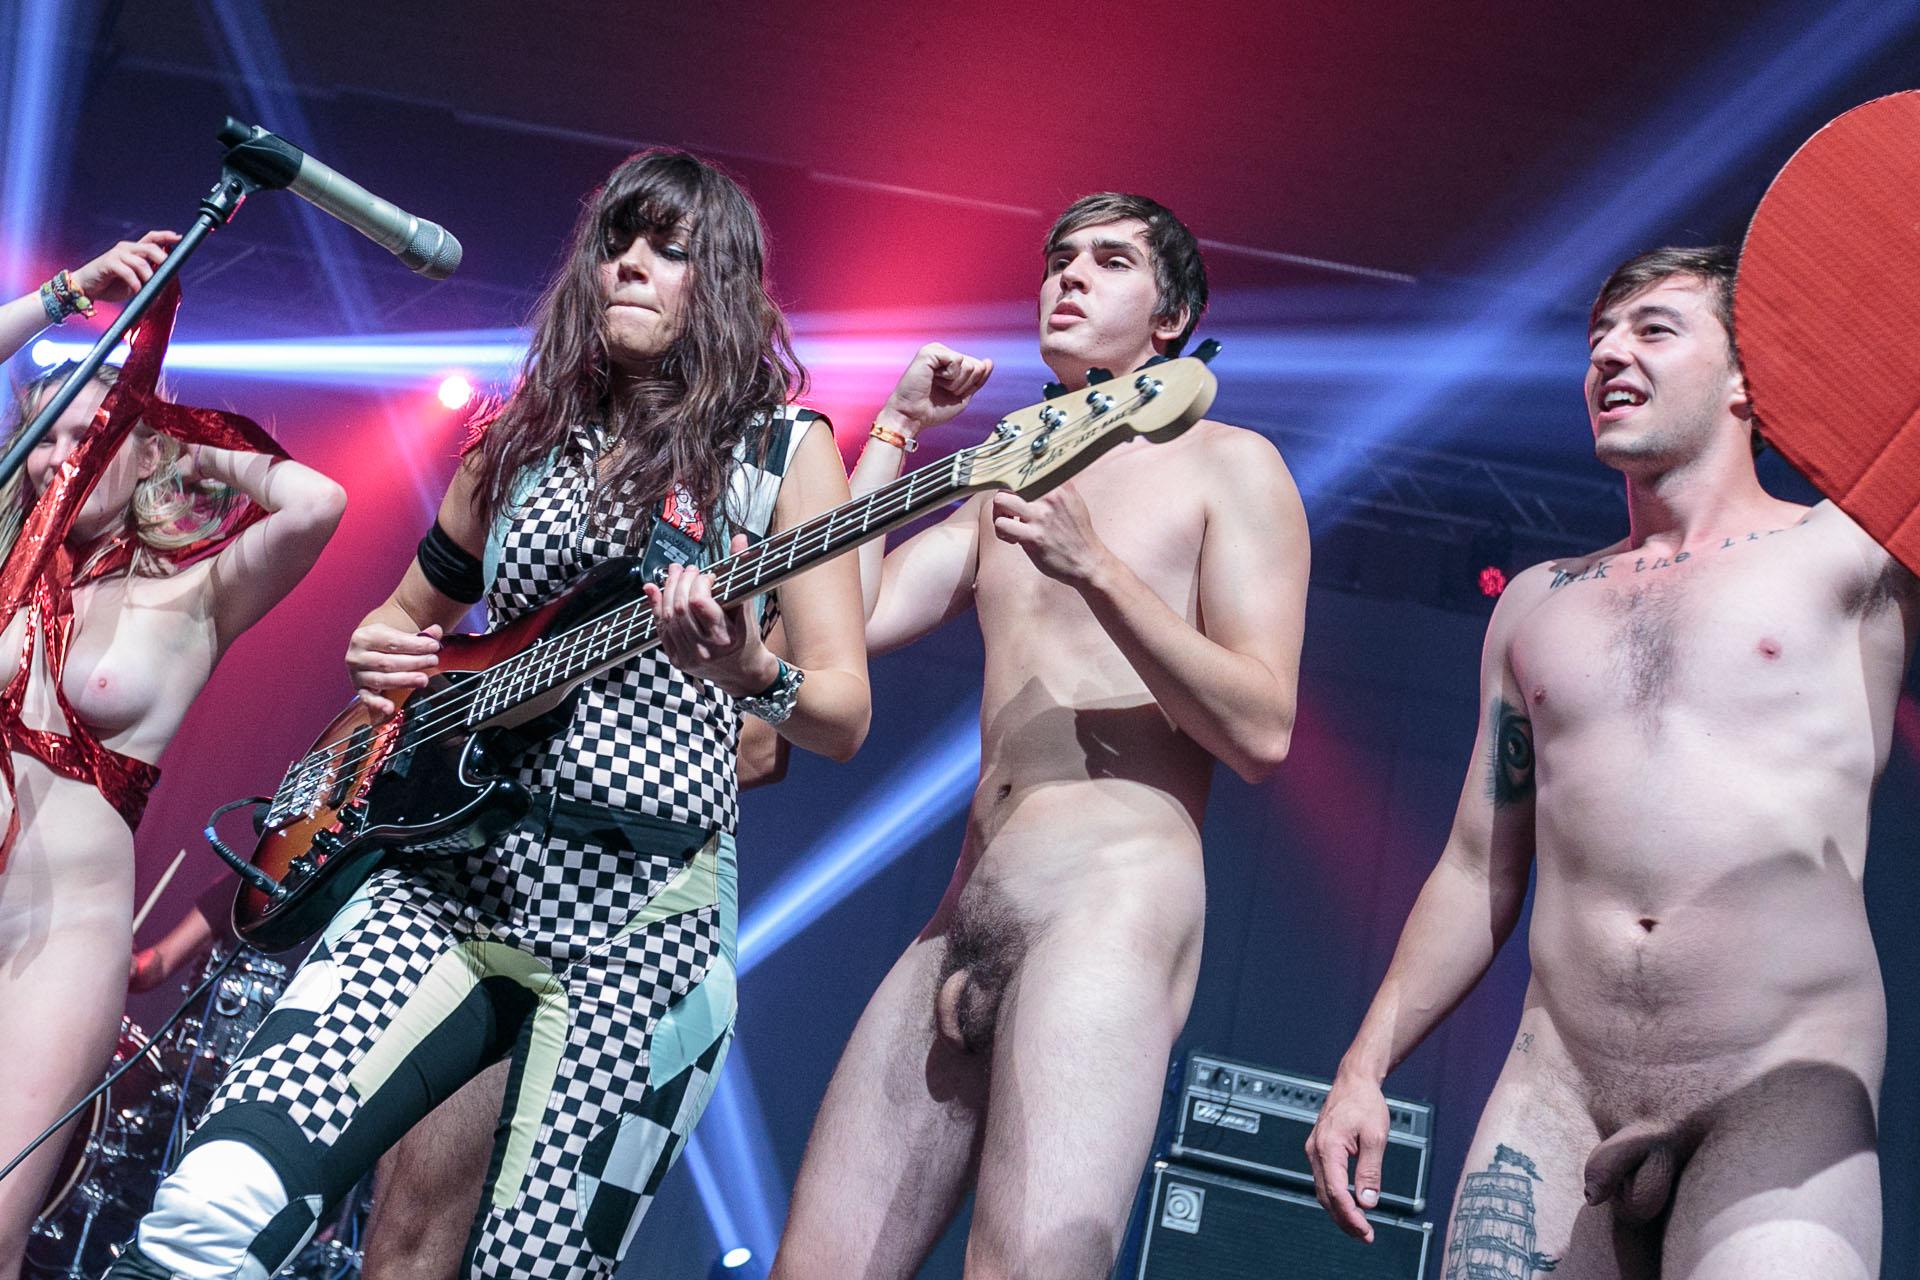 Nude chicks music clips — img 9